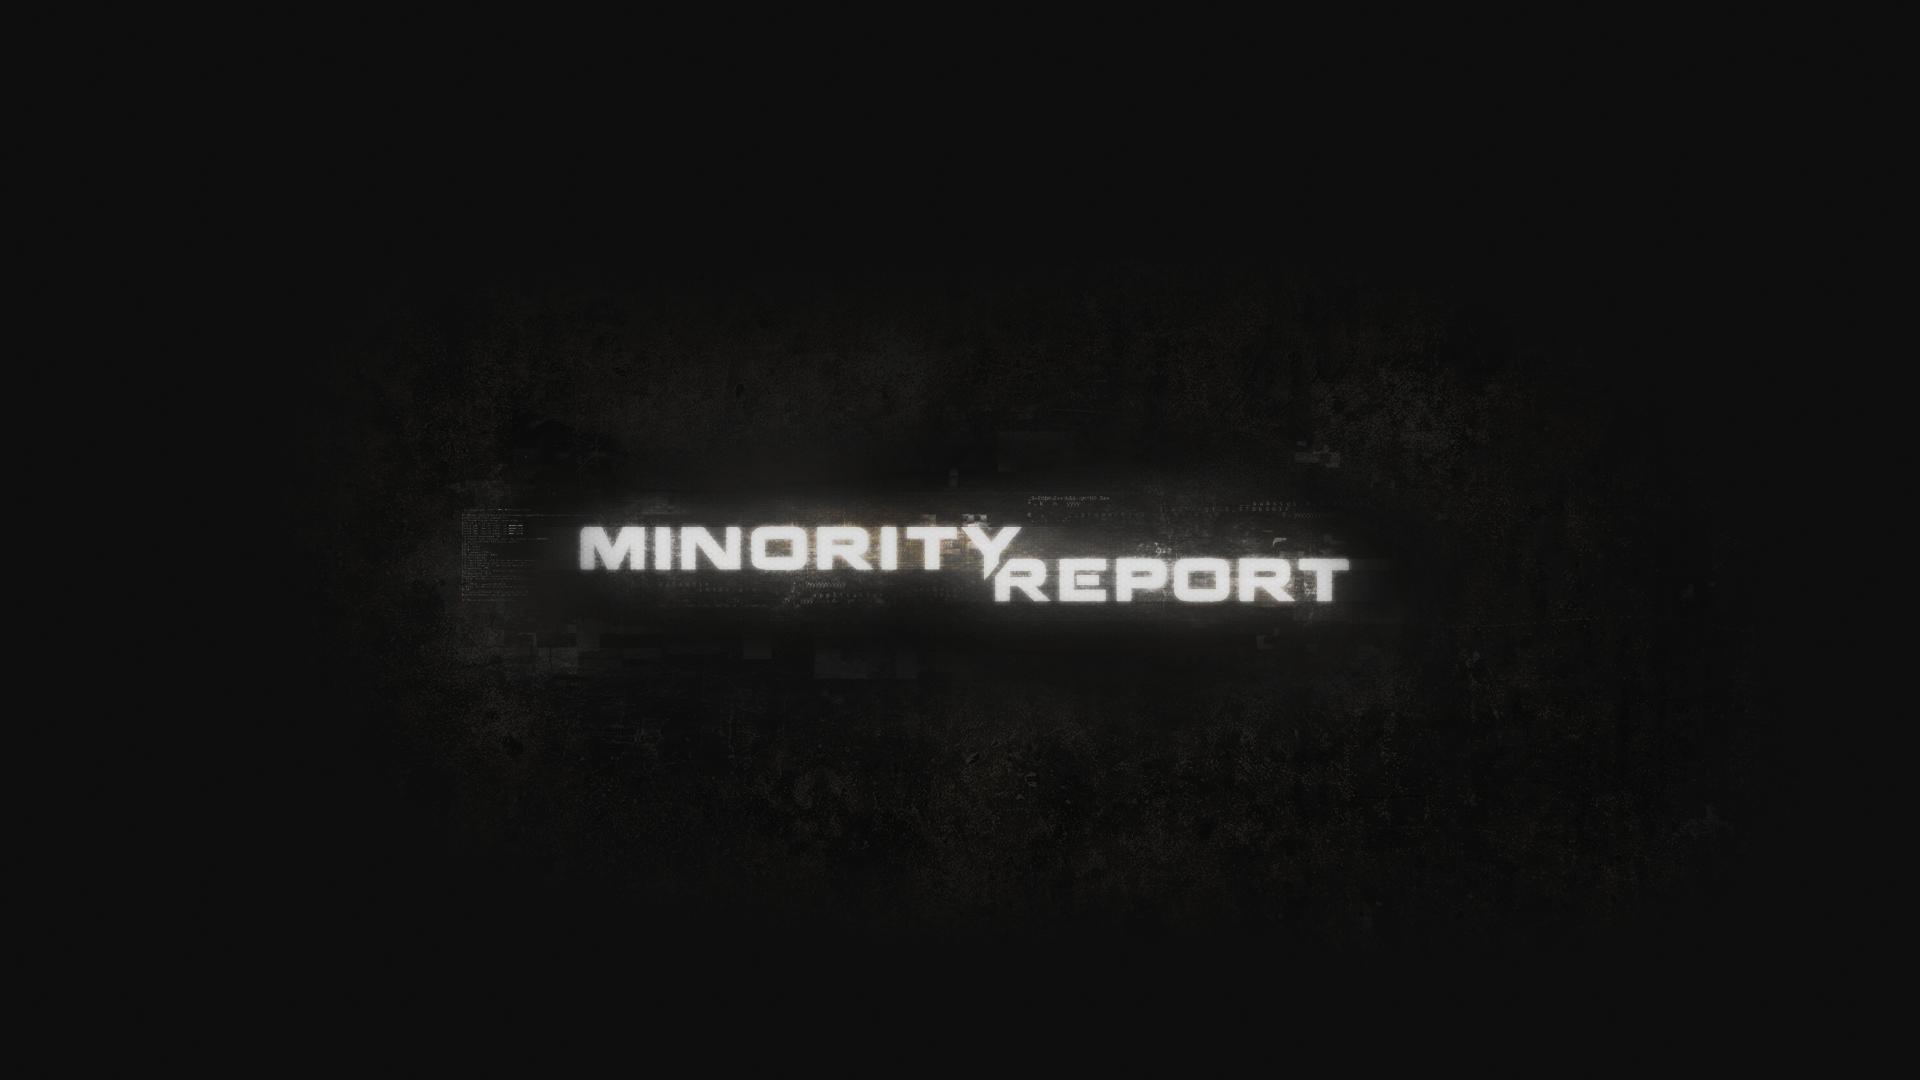 Minority-Report-3B-V01.png